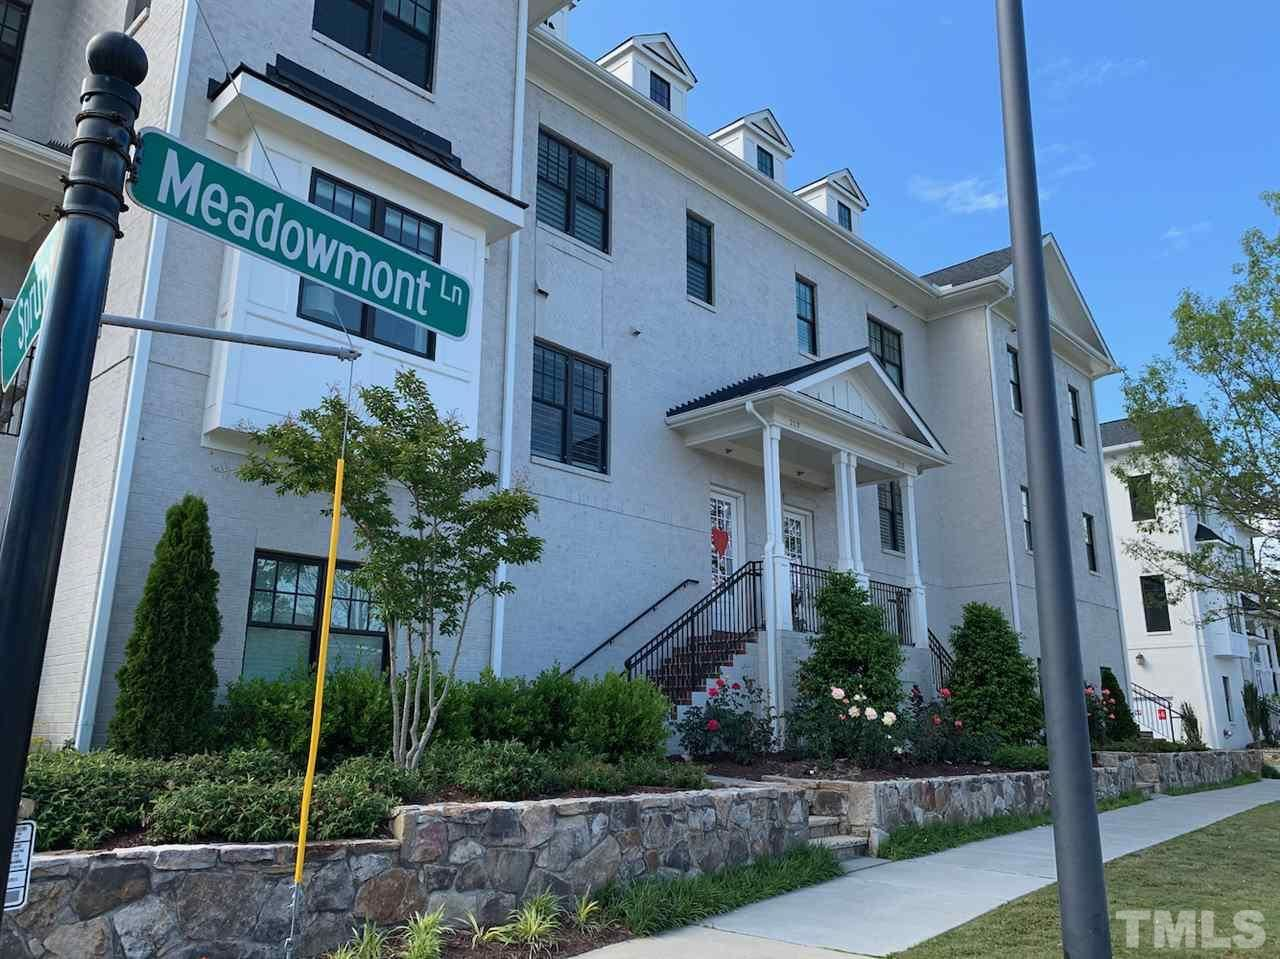 223 Meadowmont Lane #B - 6, Chapel Hill, NC 27517 - MLS#: 2317931